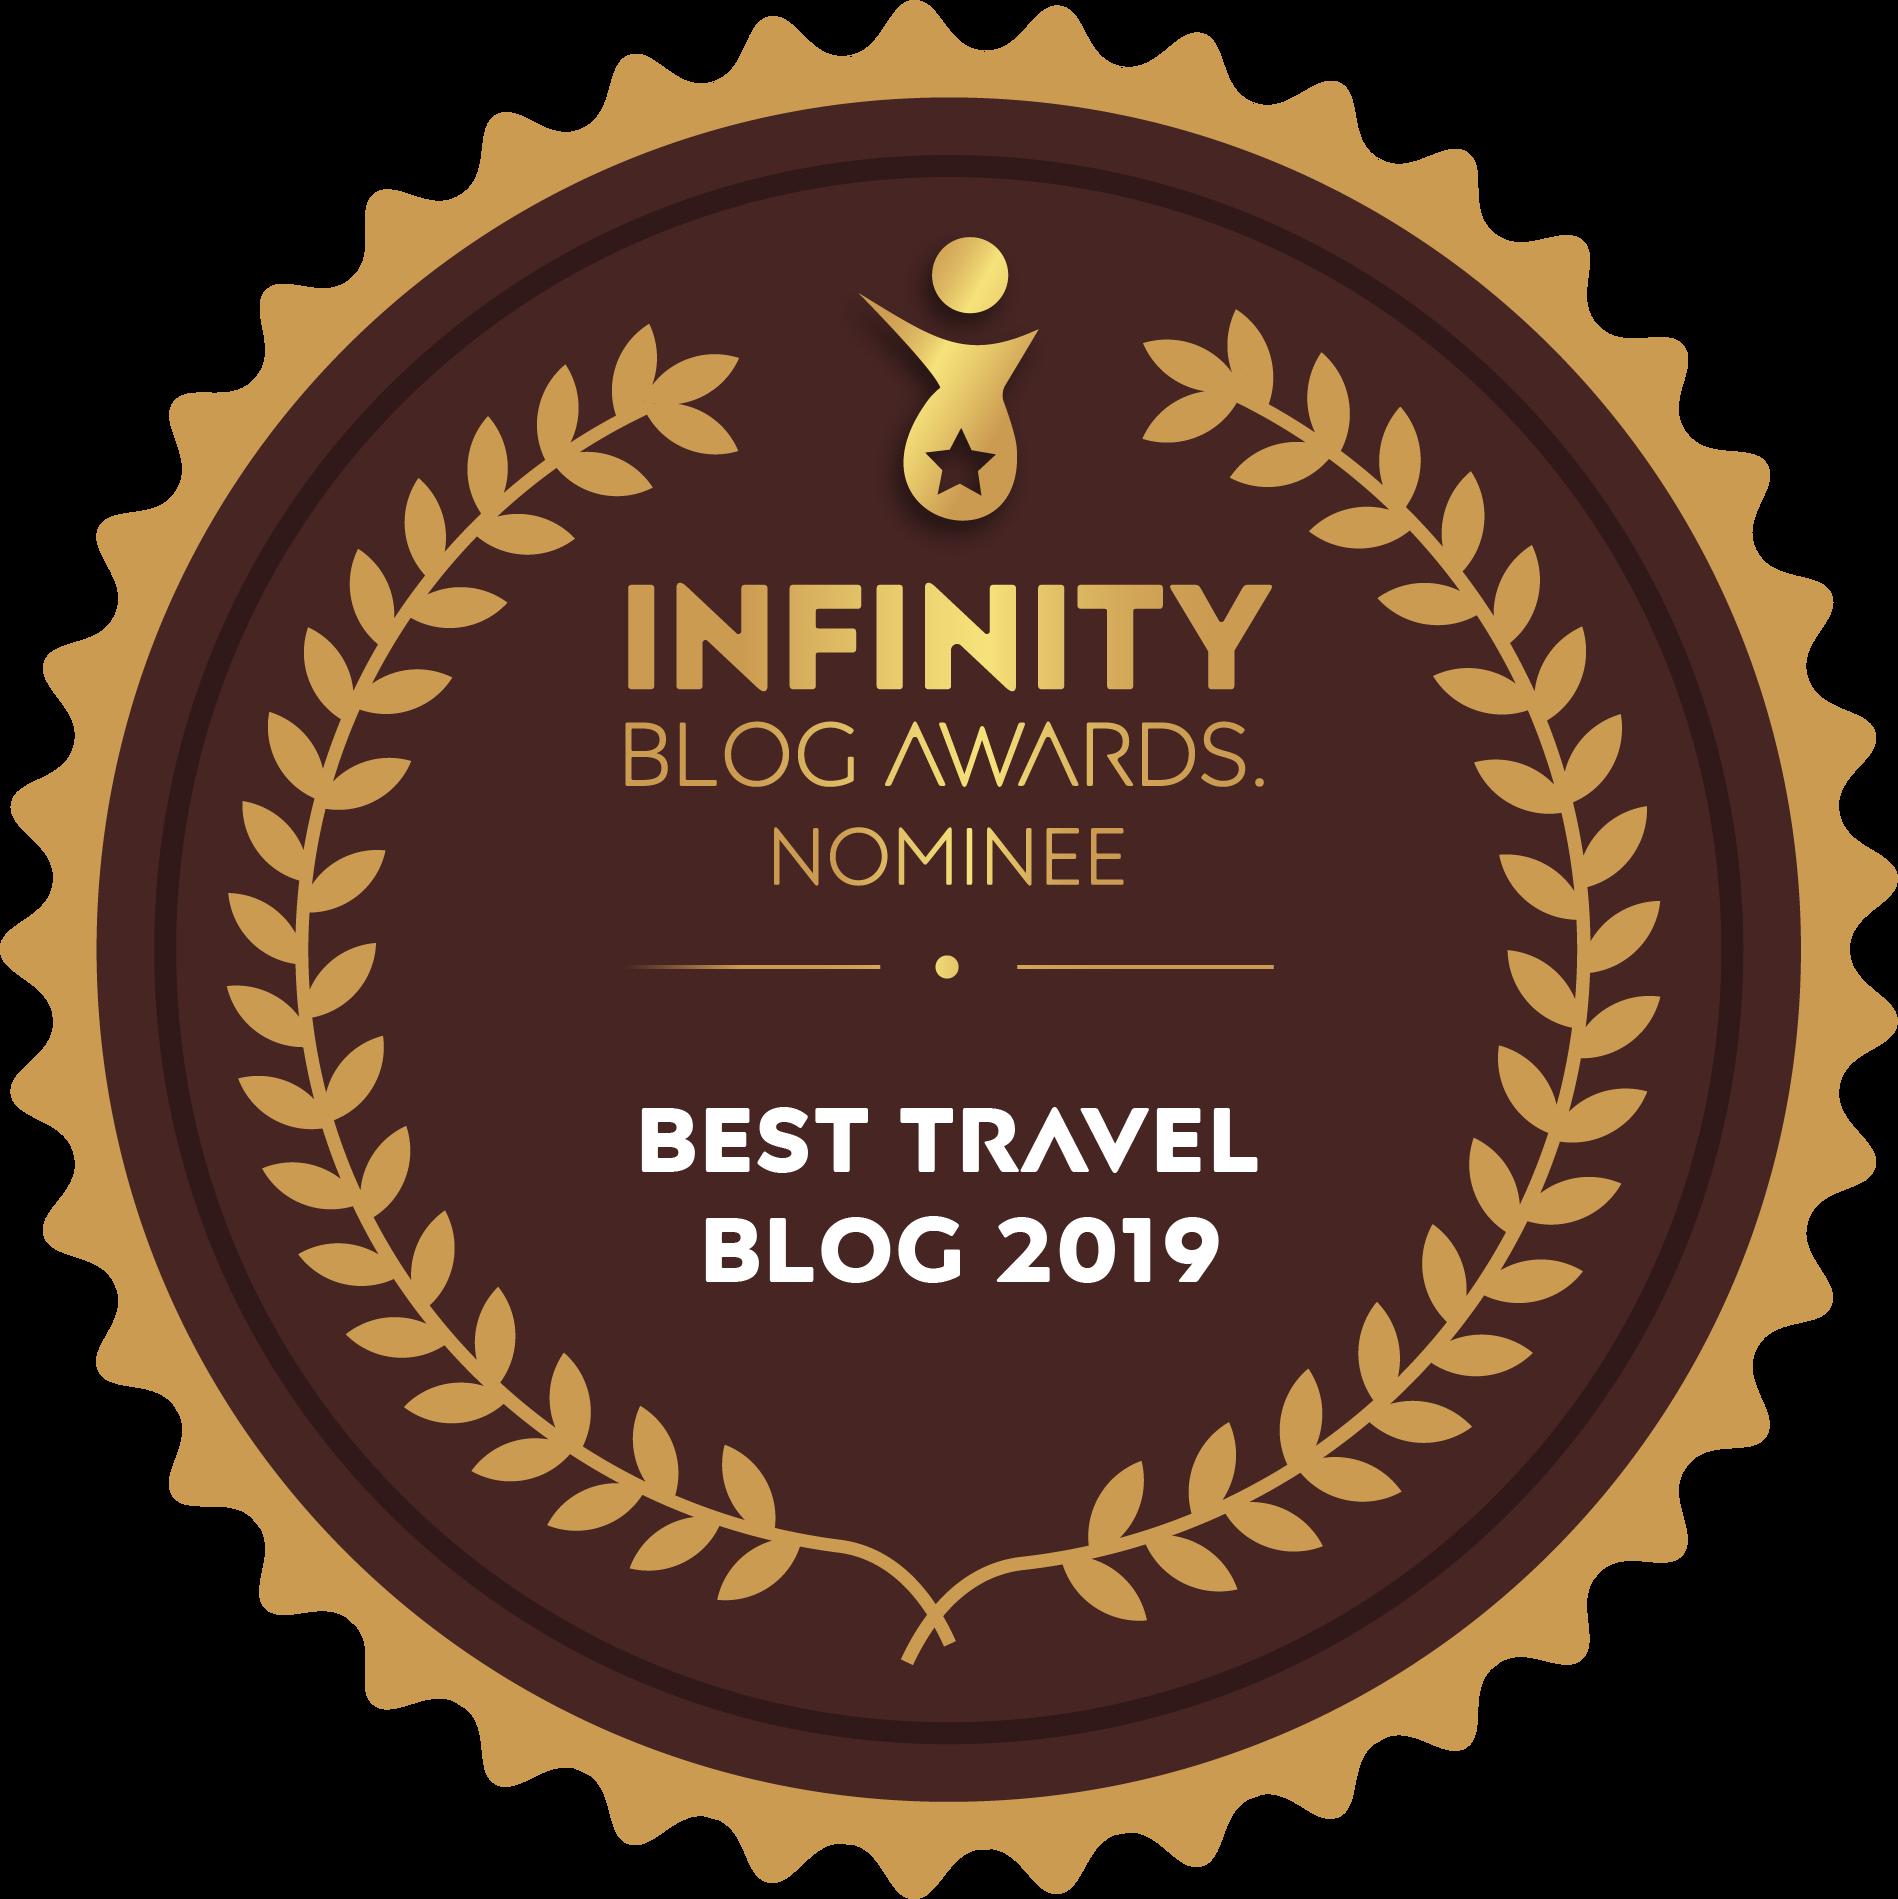 Best Travel Blog 2019 Nominee Badge